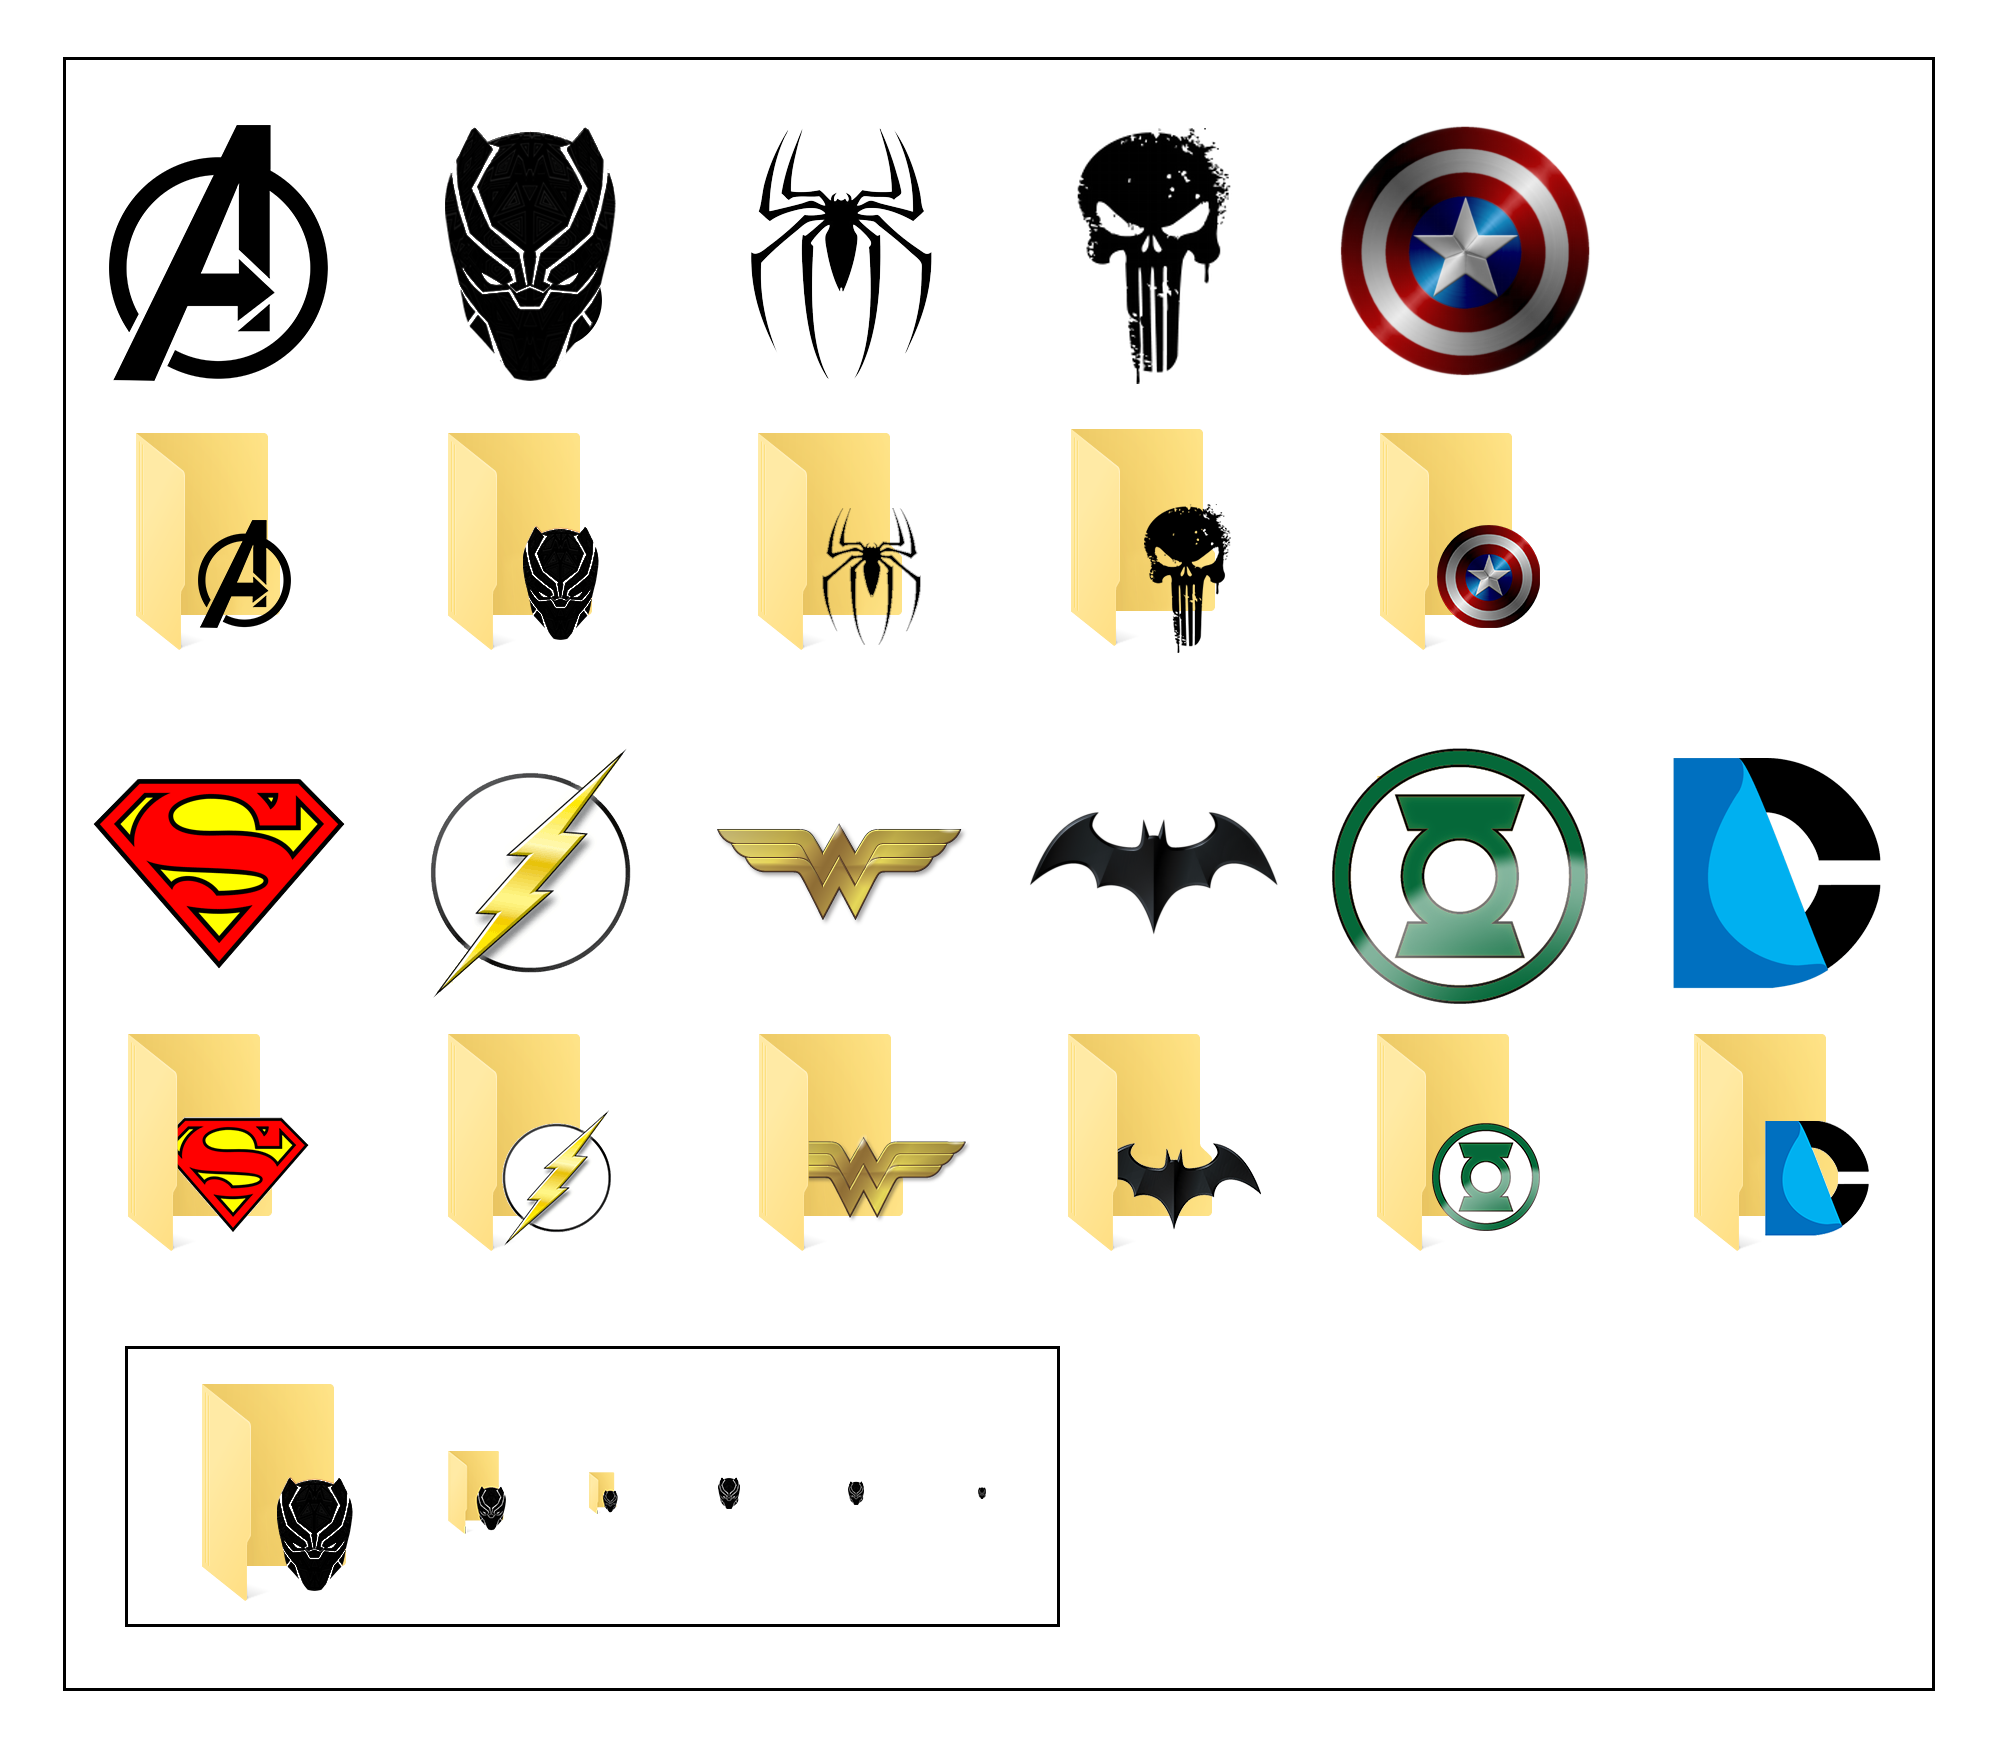 Superhero Icons For Windows 10 by JeremyMallin